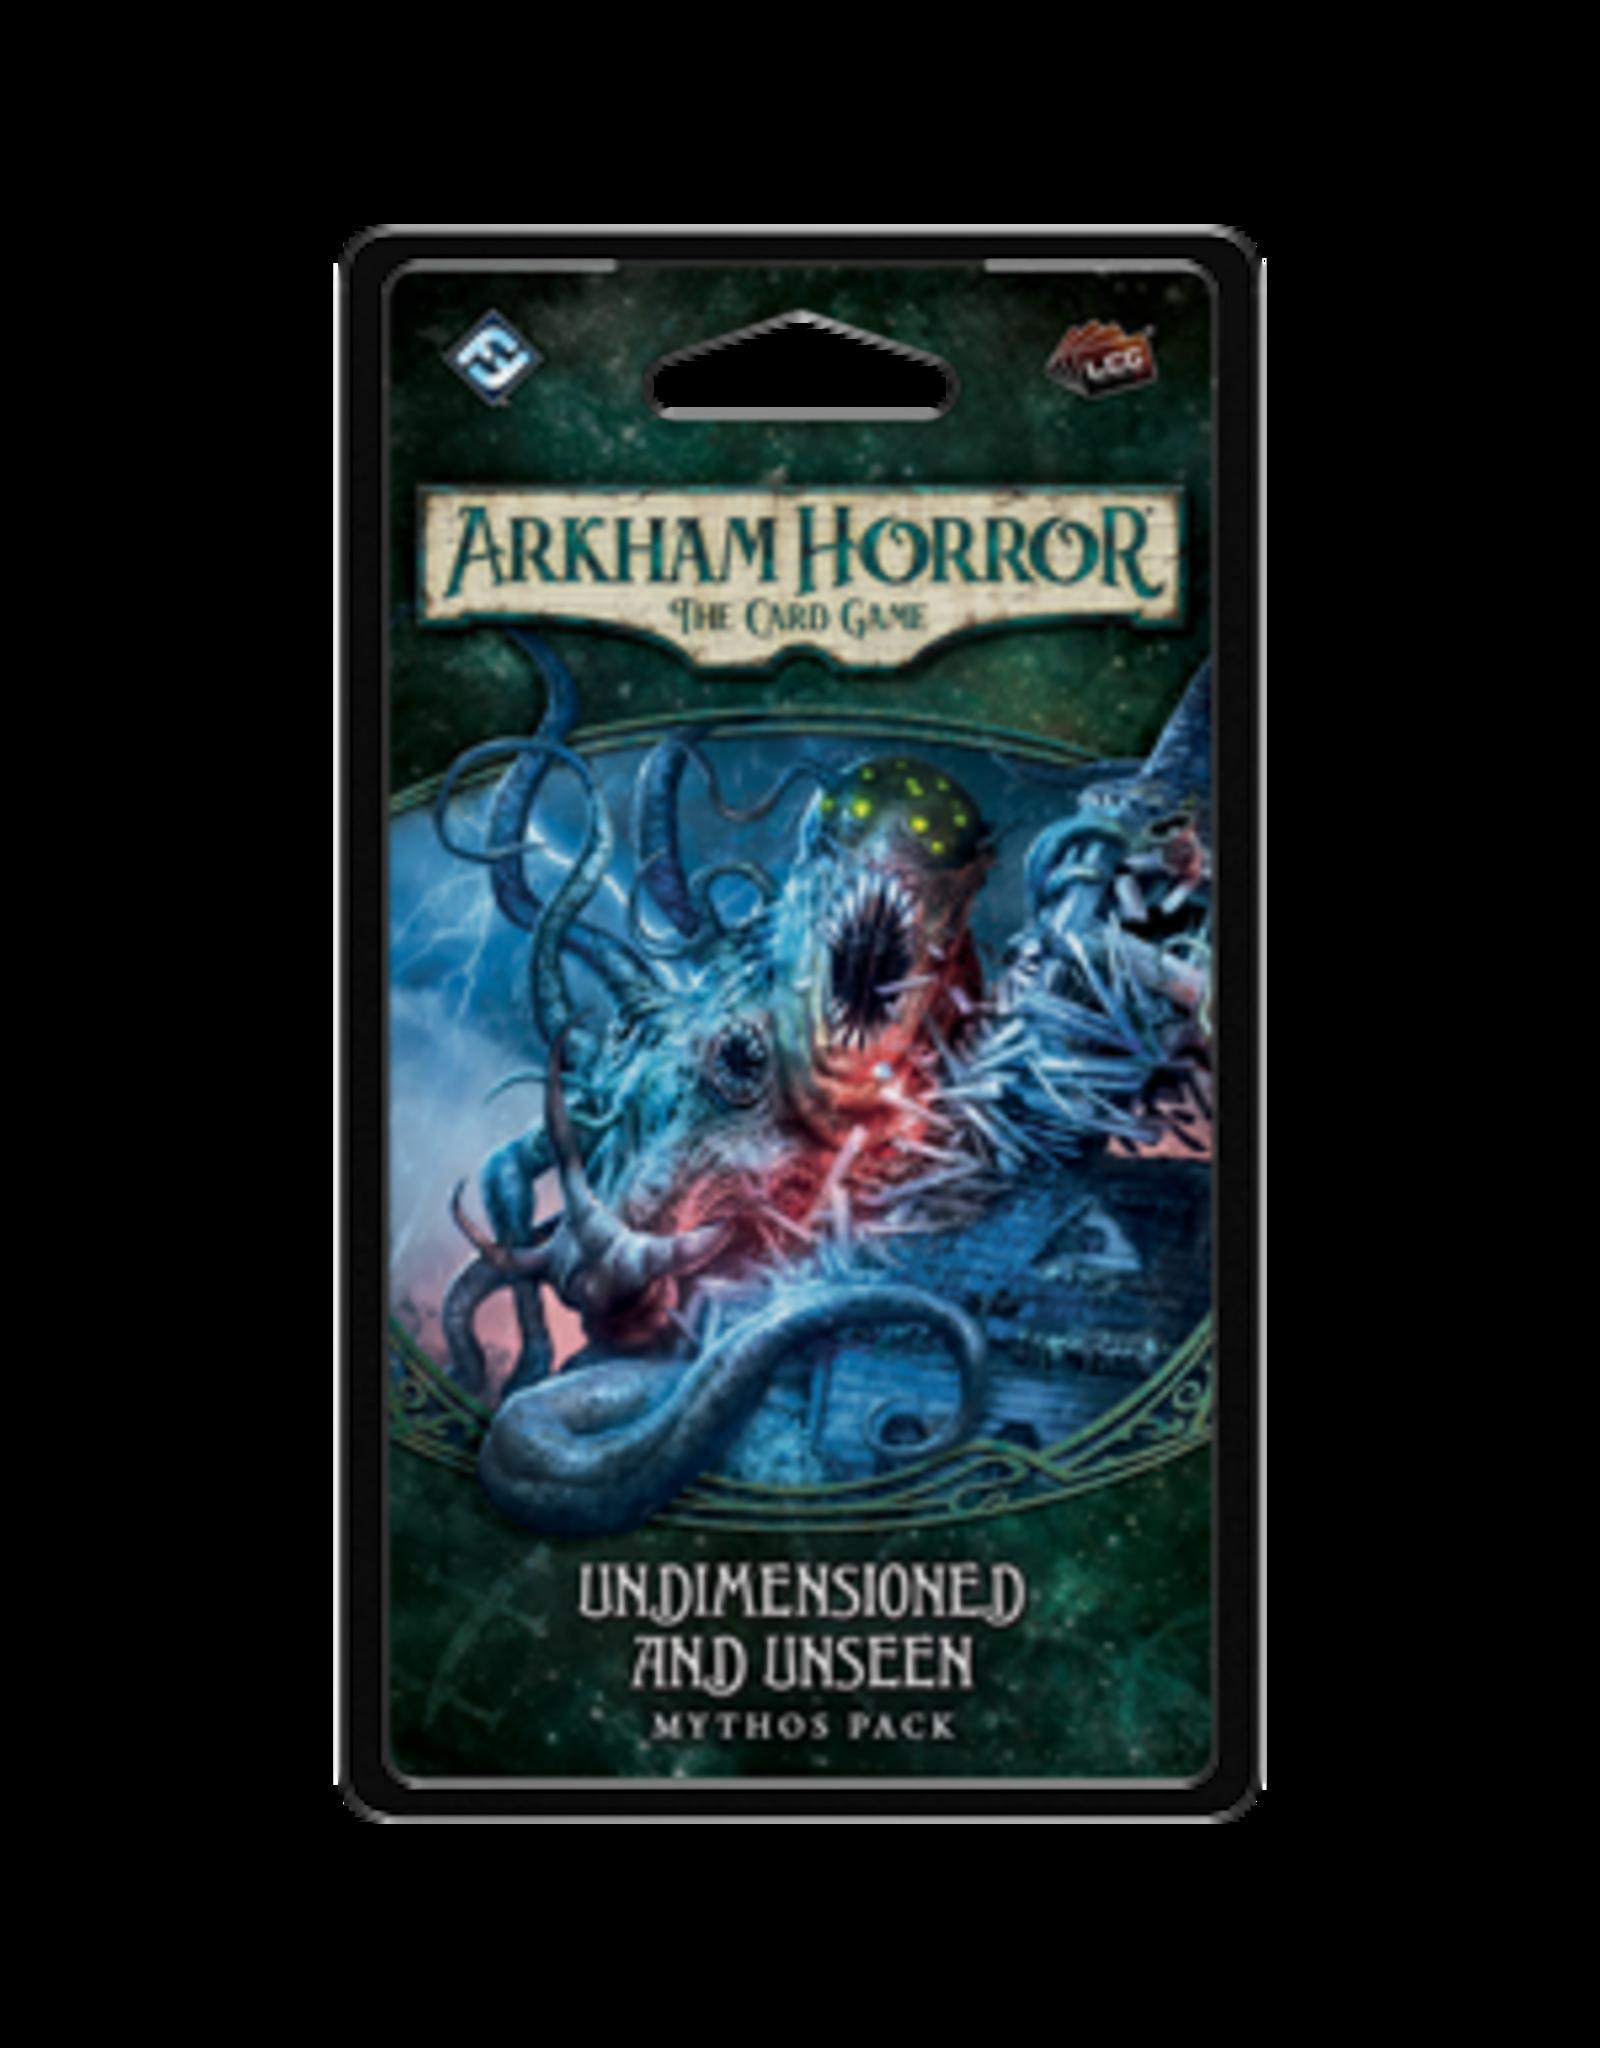 Fantasy Flight Games Arkham Horror LCG Undimensioned and Unseen Mythos Pack